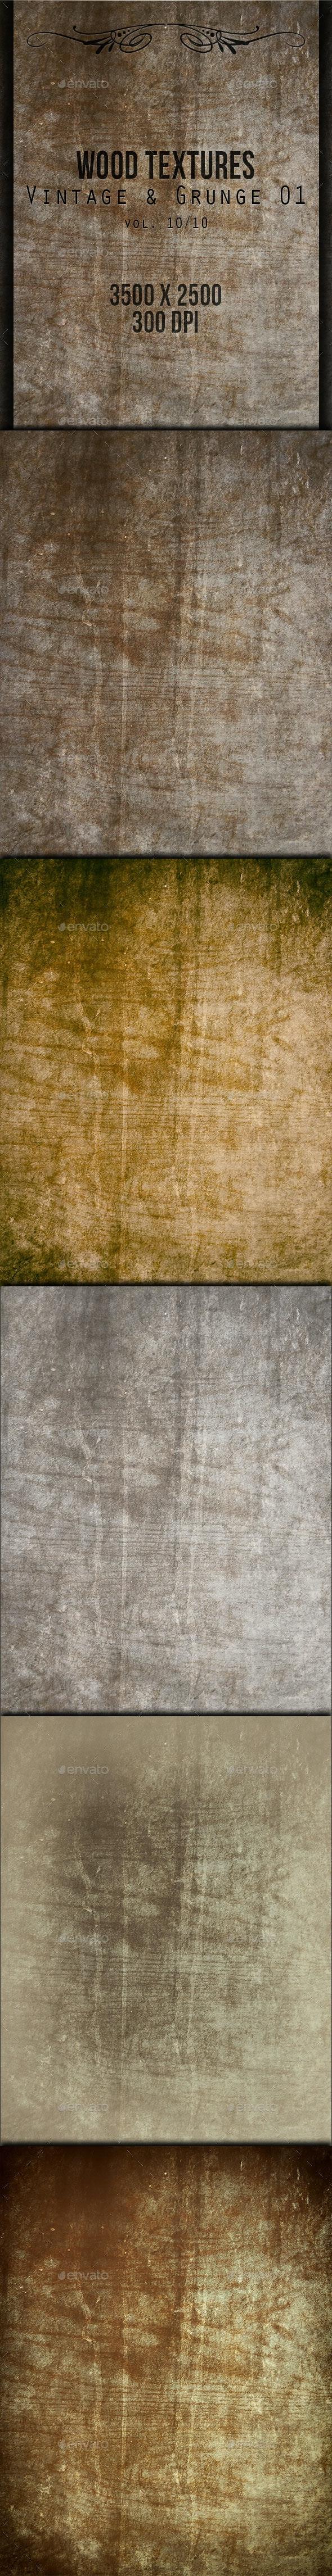 Wood Textures - Vintage & Grunge 01 vol. 10 - Wood Textures